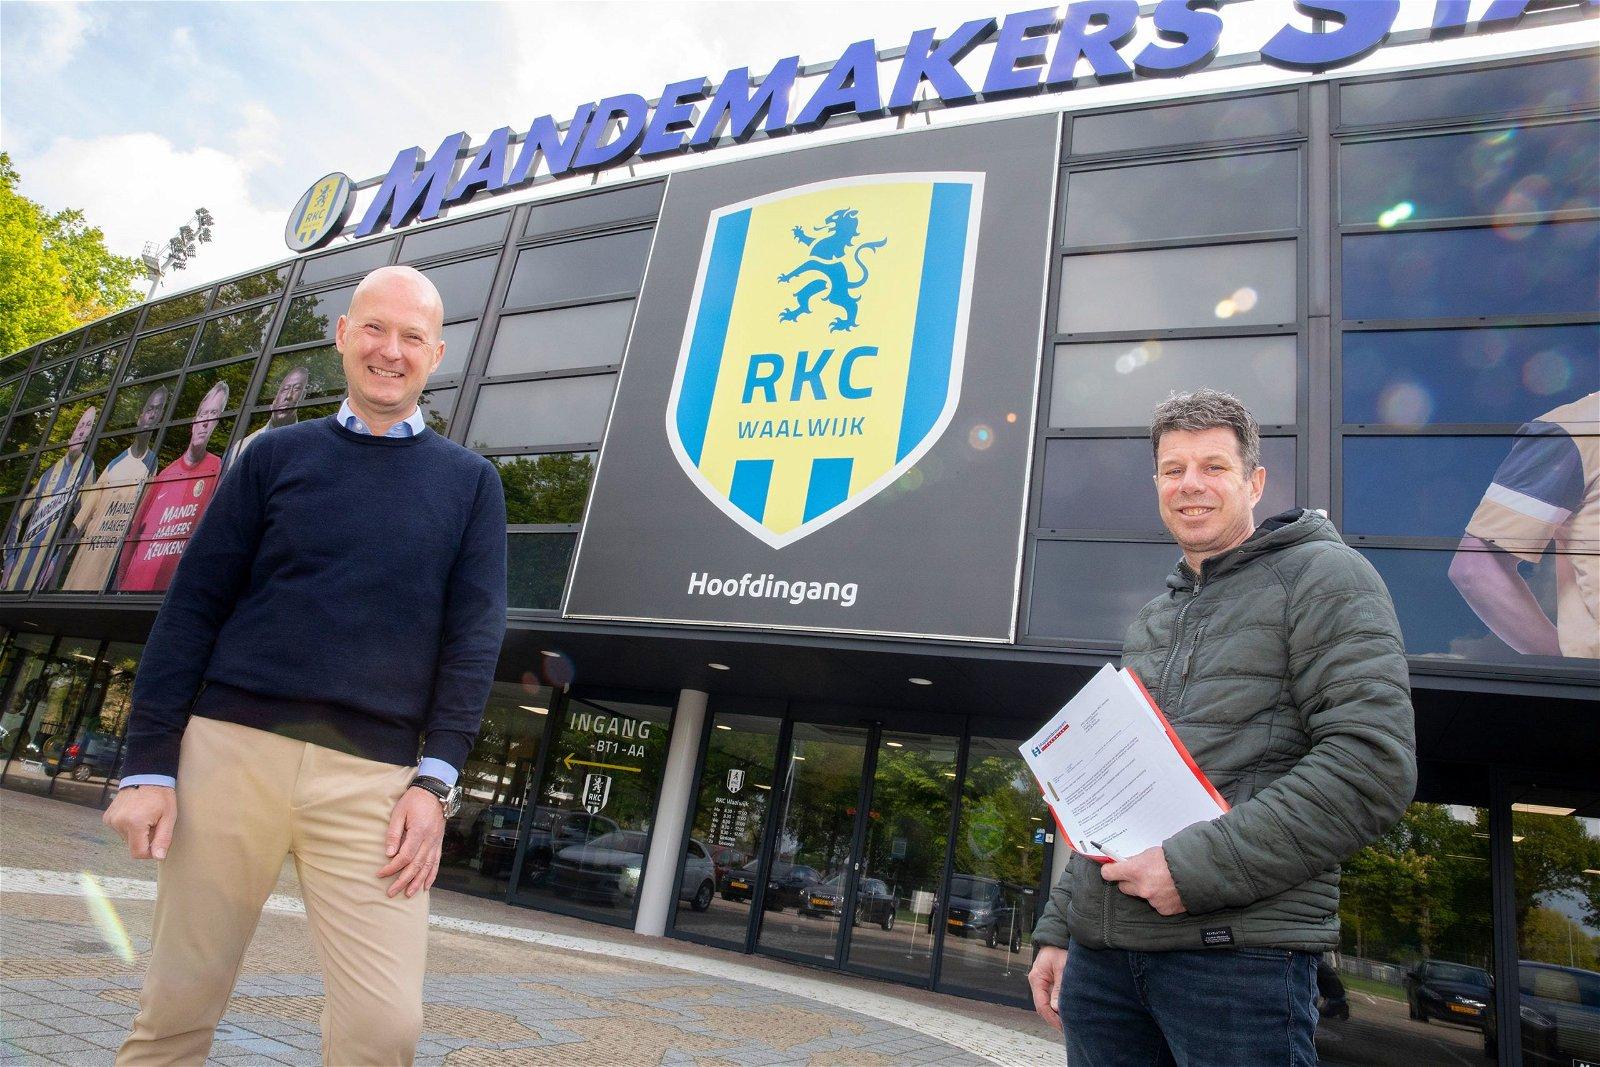 Hoppenbrouwers - RKC Waalwijk